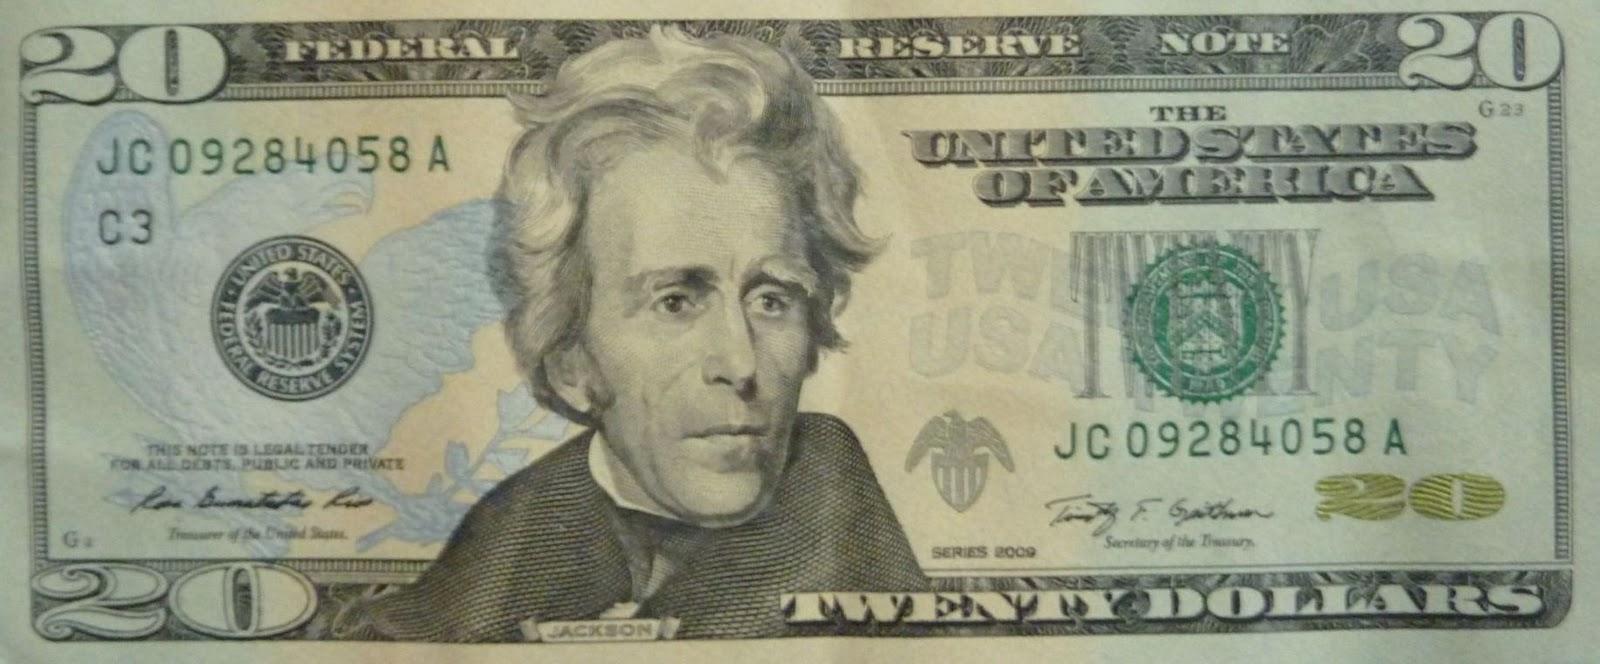 twenty segments andrew jackson is on the twenty dollar bill